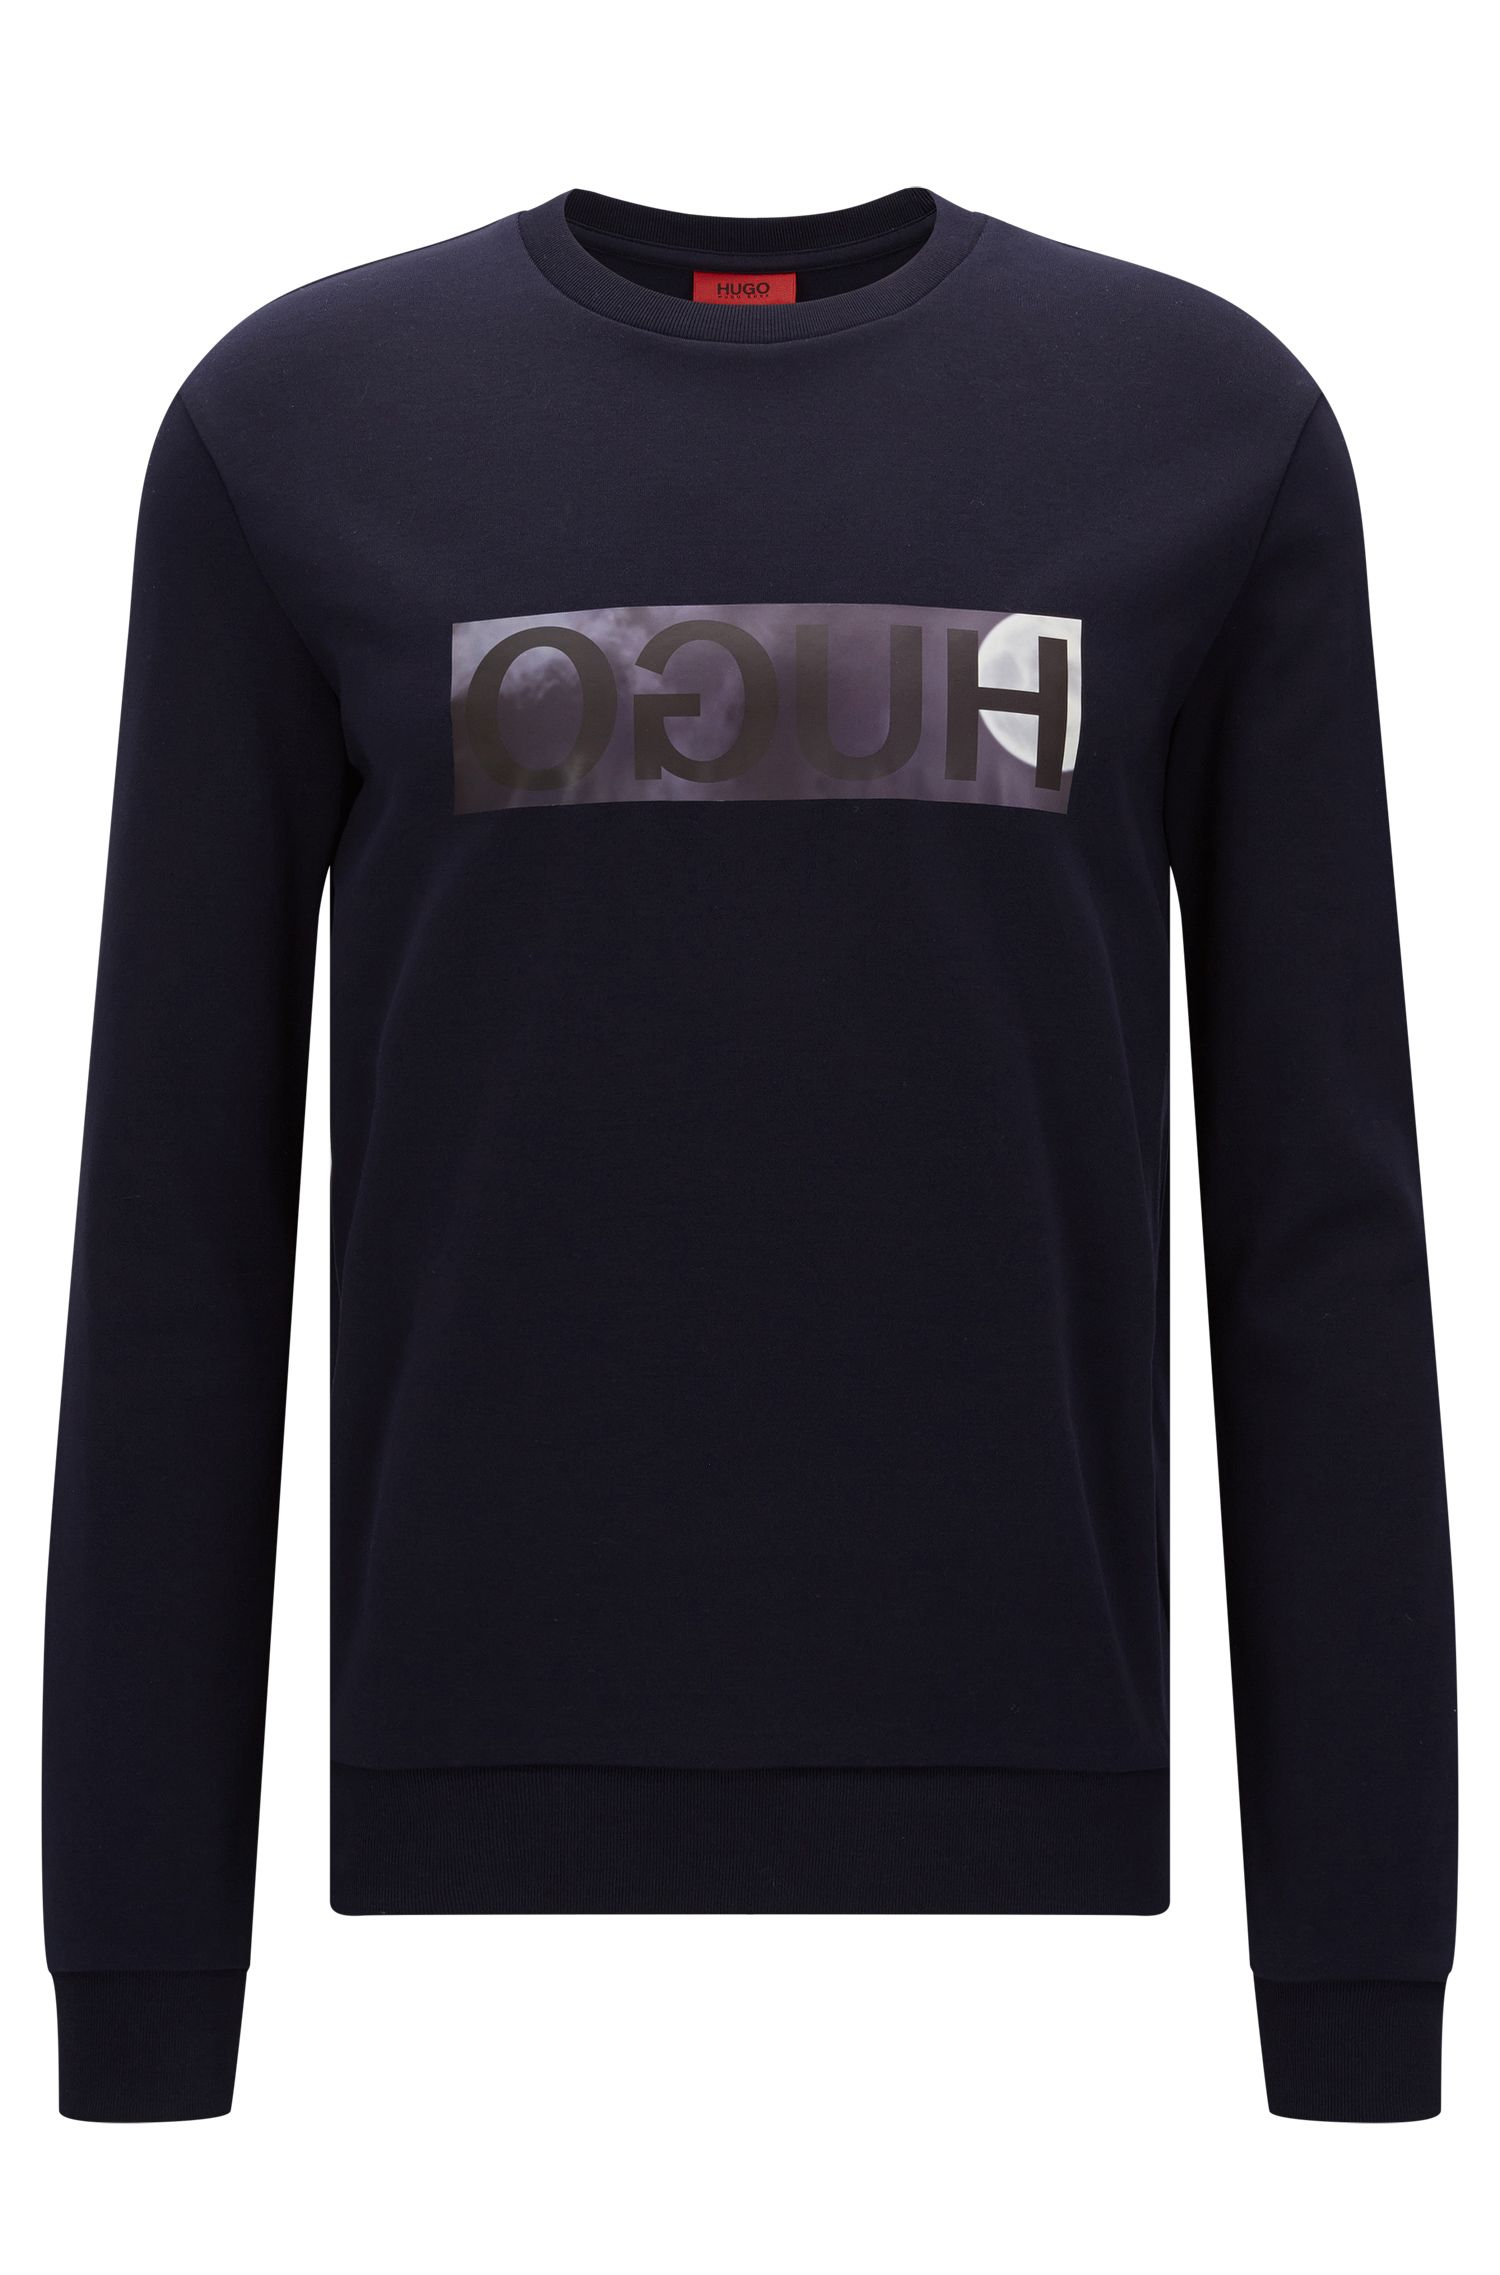 'Dicagos' | Rubber Print Sweatshirt